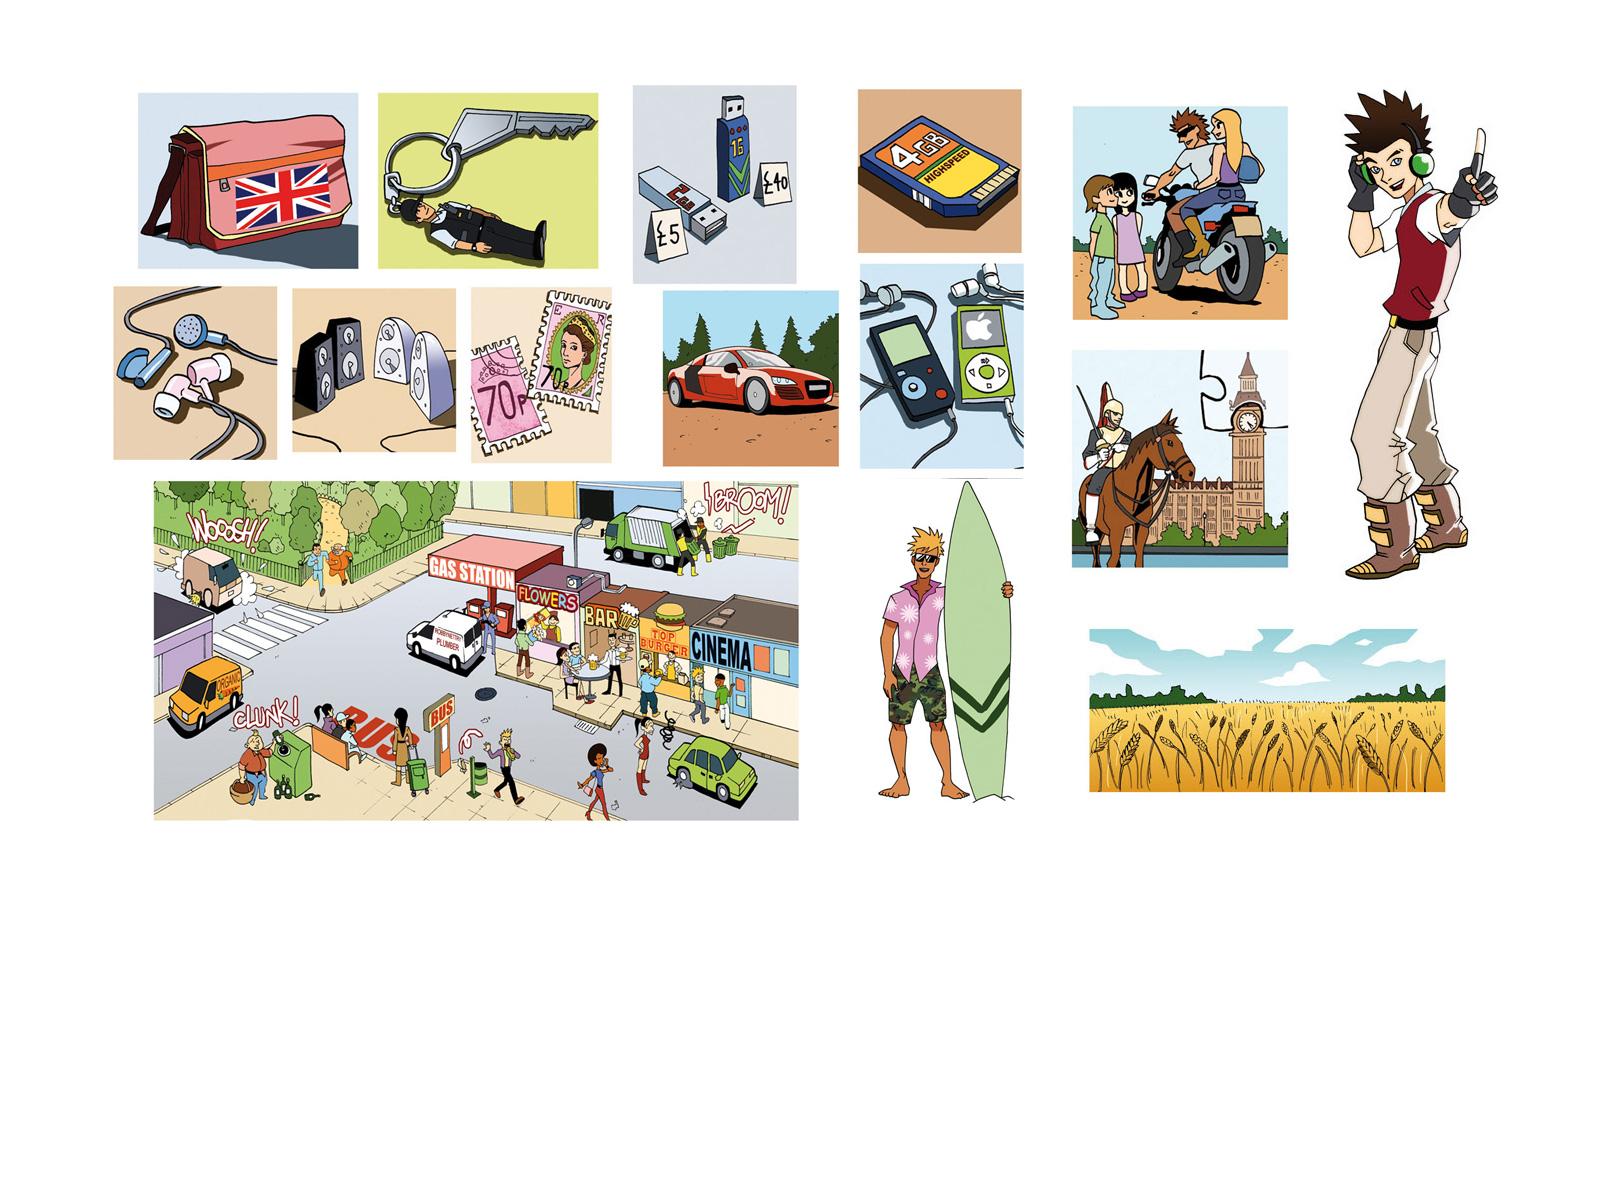 RECIOAlfonso-Illustrations-EDITIONS-2808